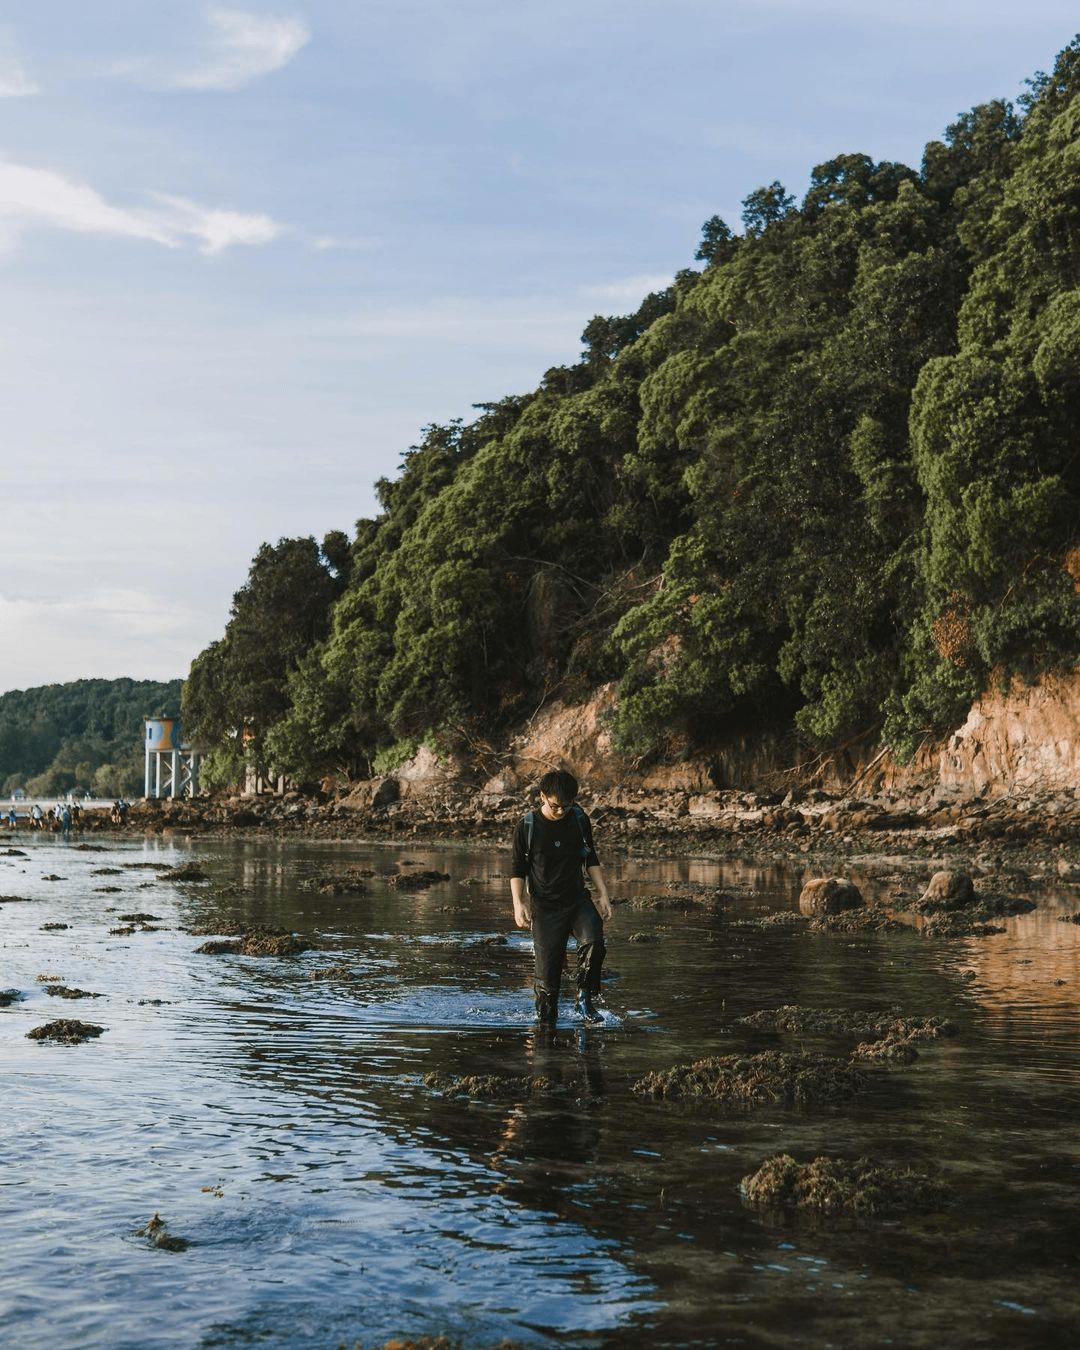 Tanjong Rimau Beach - Tide Pools